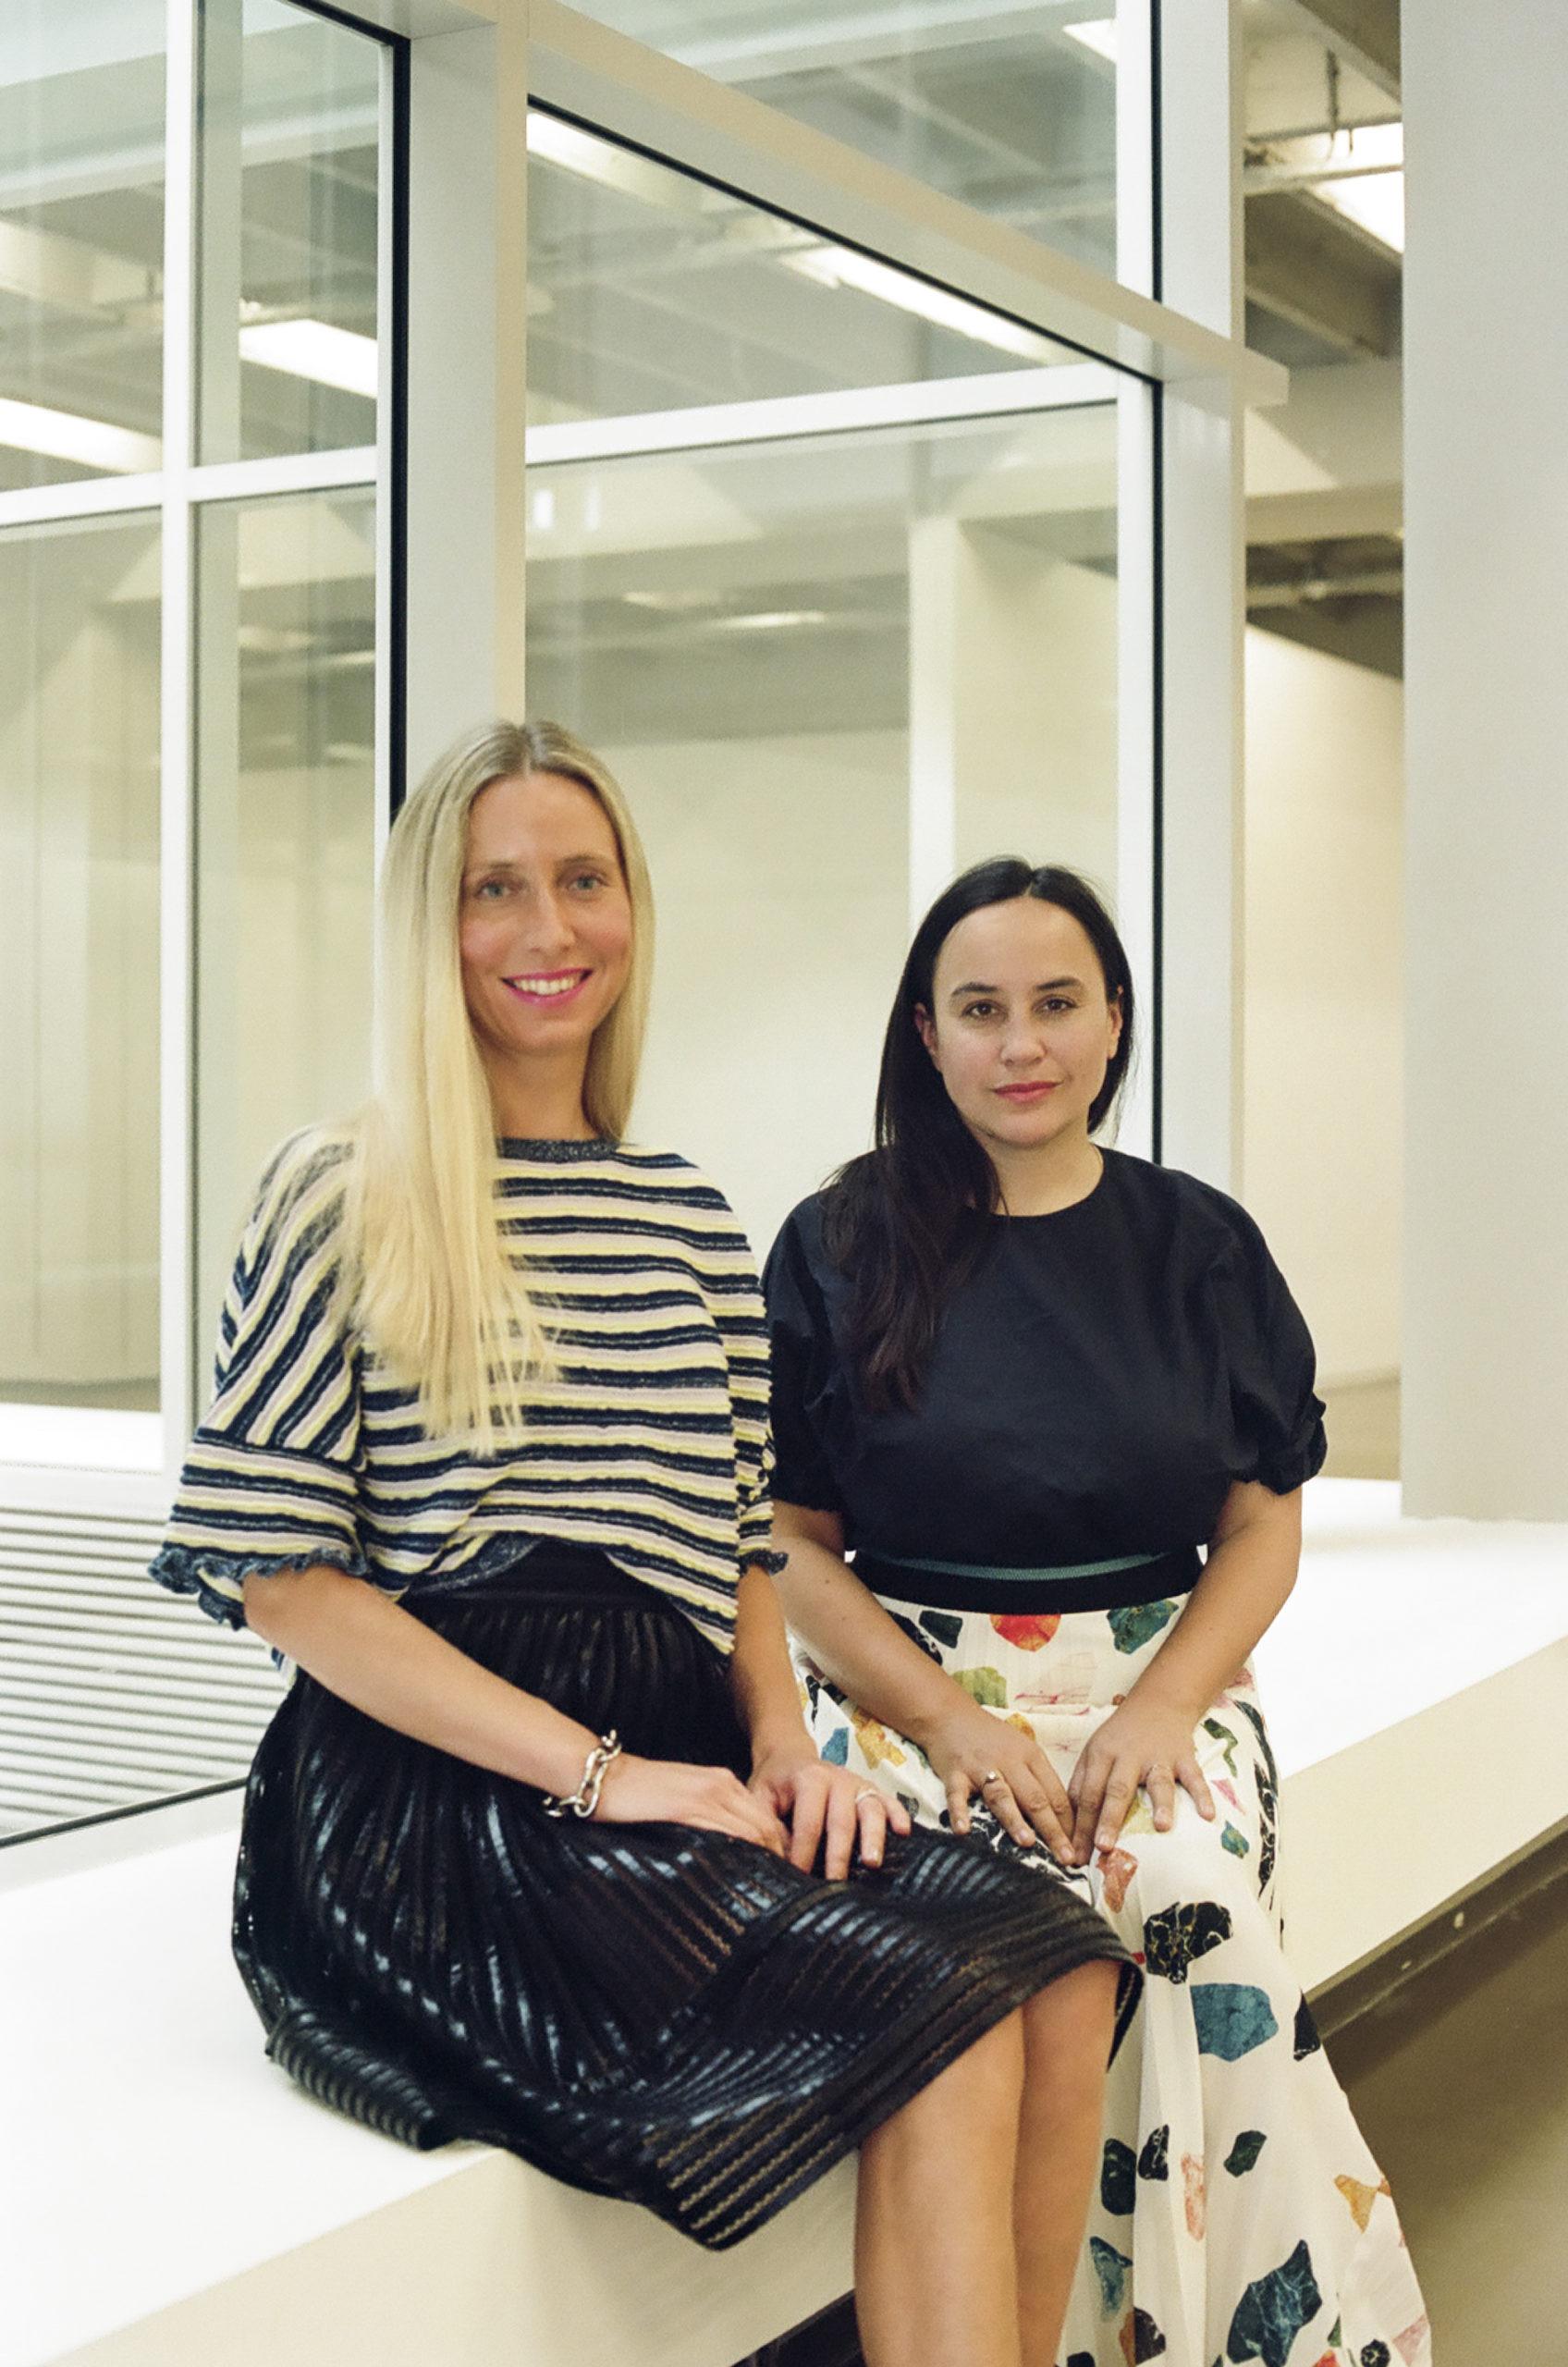 portrait of two women sitting from aa window in a gallery space